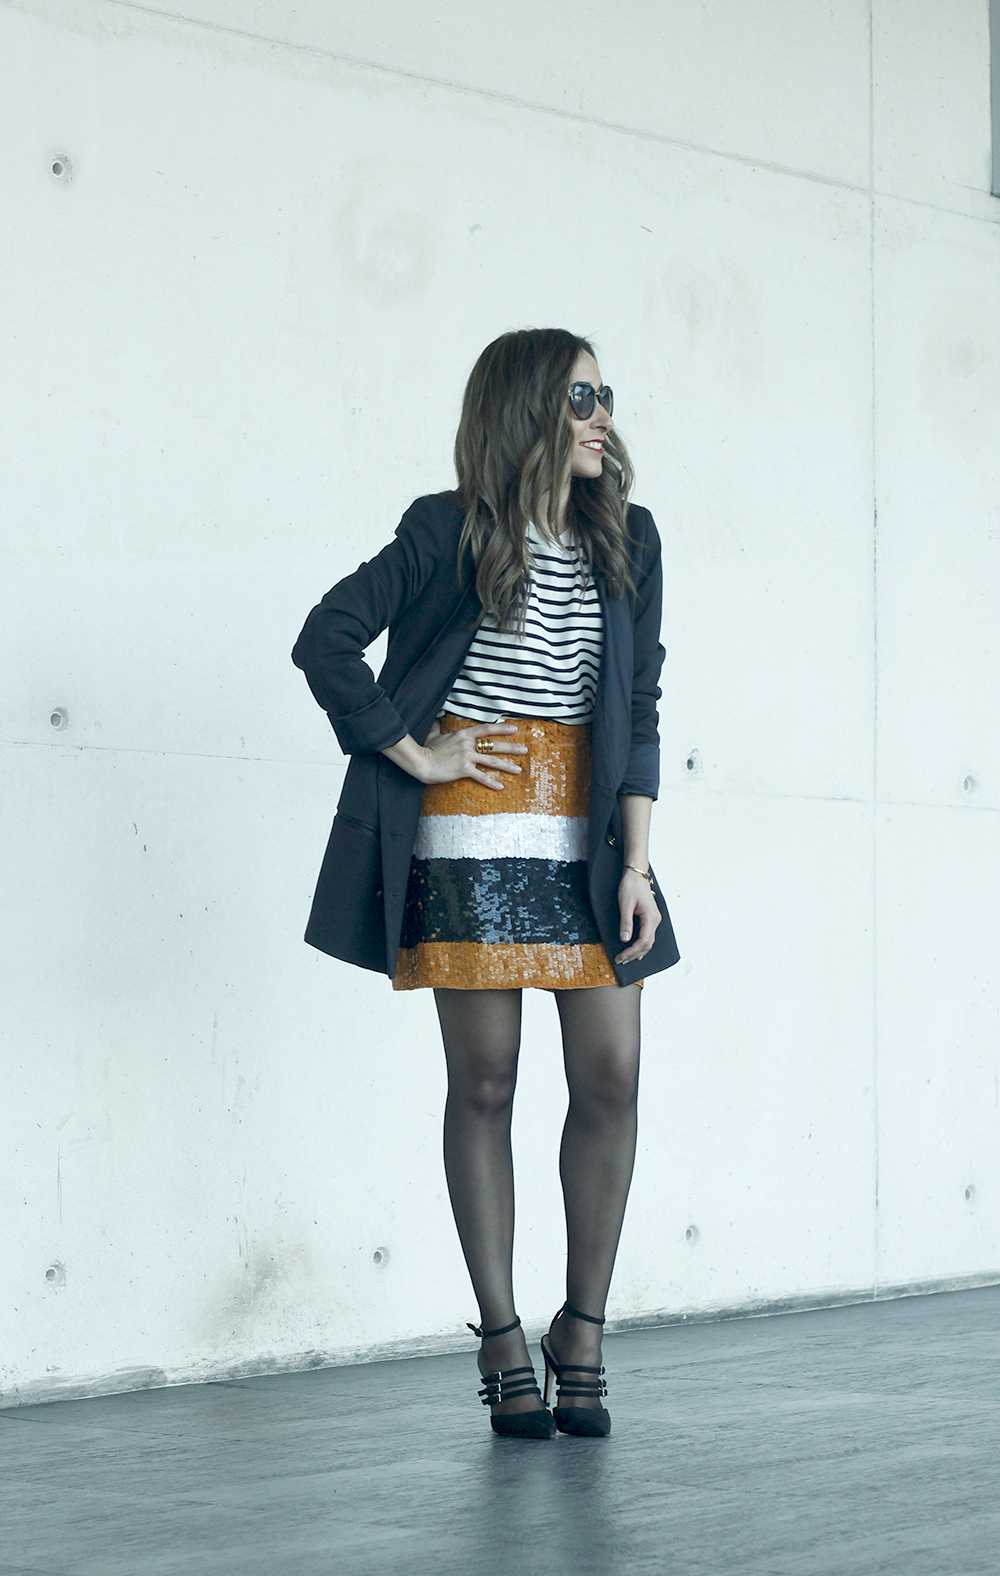 Striped T-Shirt Sequin skirt black blazer madrid fashion week street style fashion outfit04.jpg10